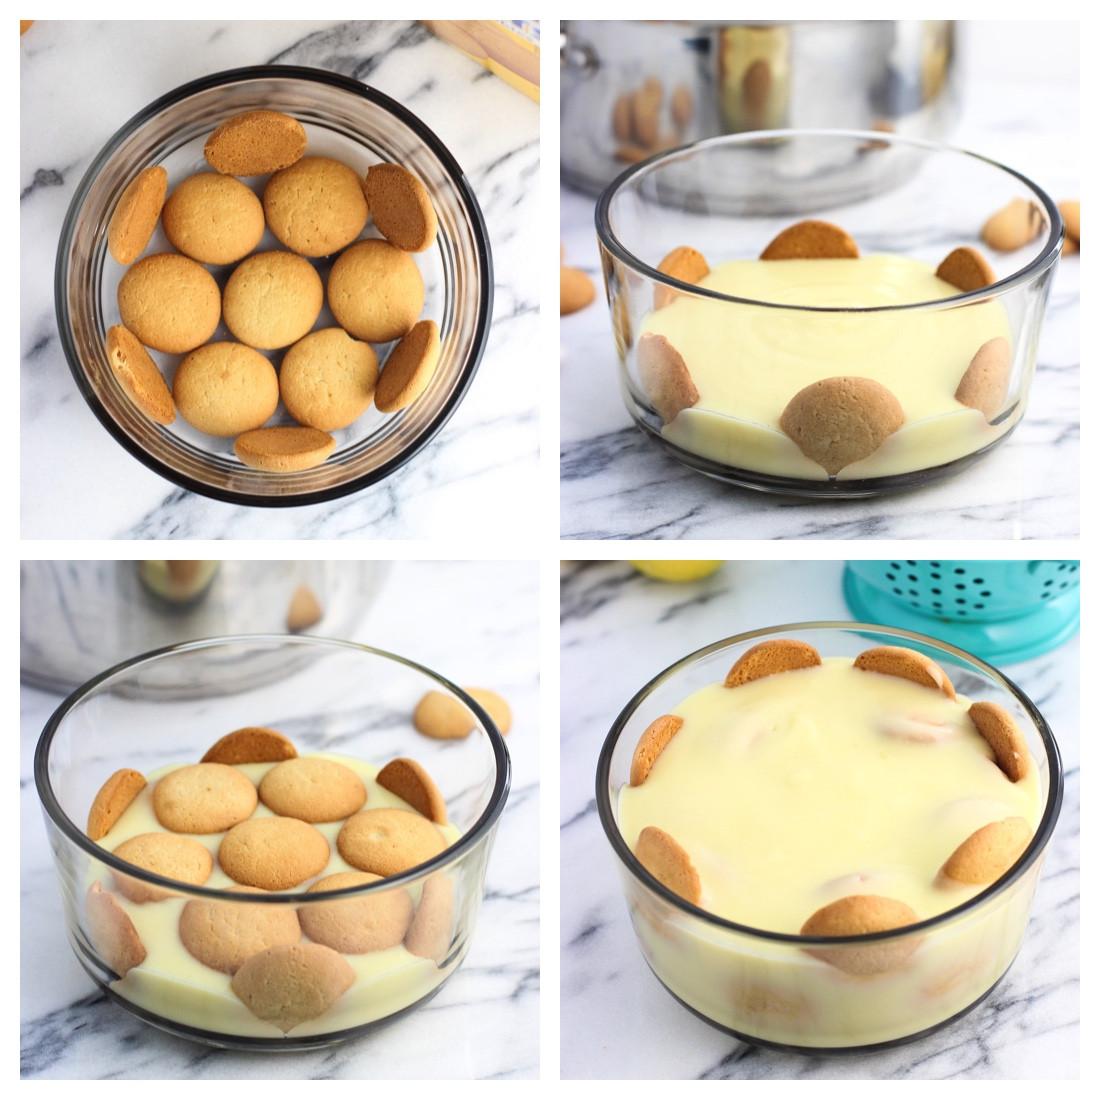 Coconut Milk Desserts  Coconut Milk Lemon Pudding with Fruit